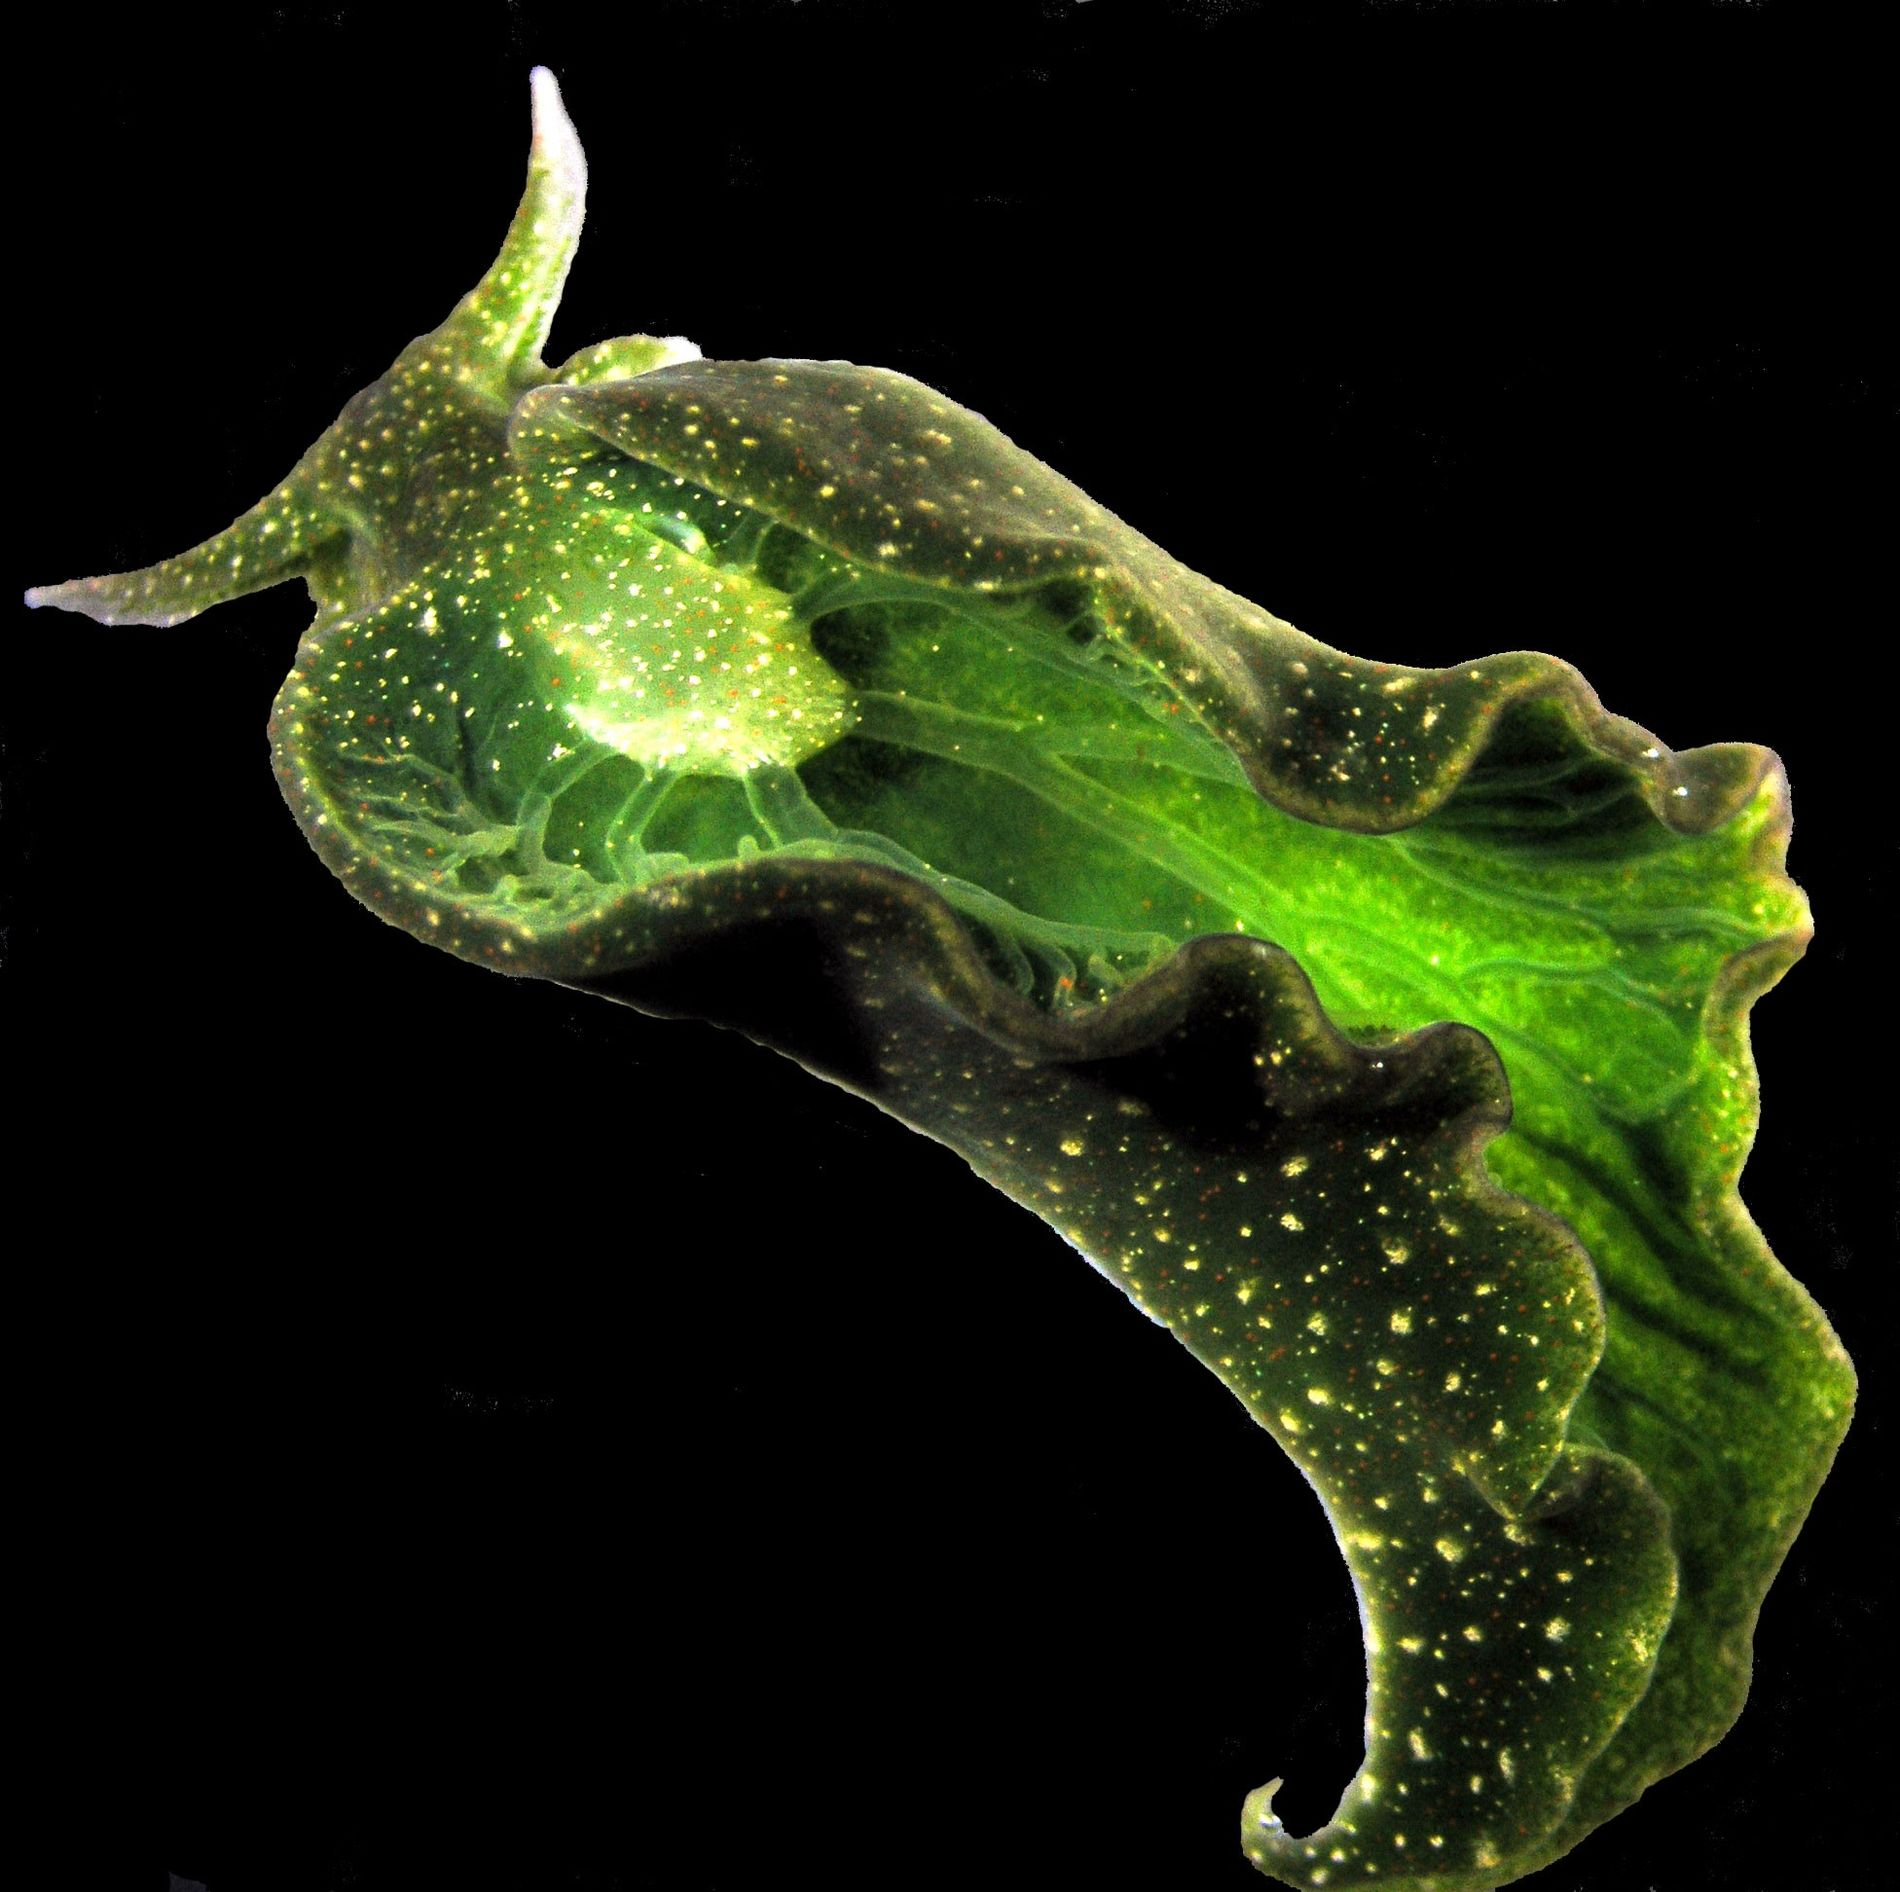 Elysia cholorotica, a sea slug found off the U.S. East Coast, can steal photosynthetic plastids from ...